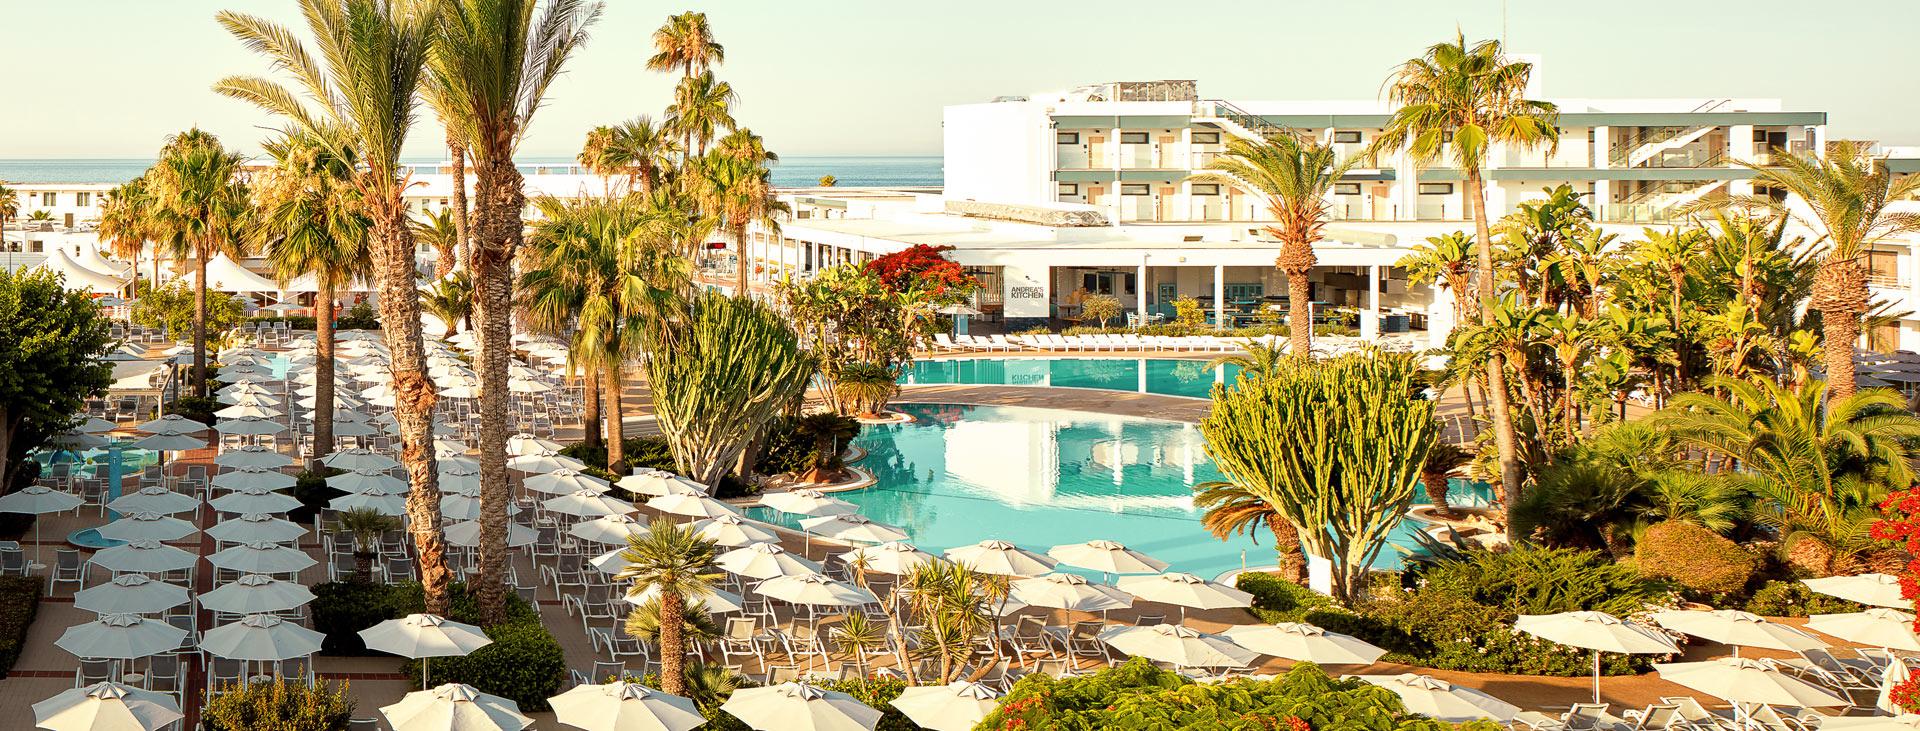 Sunwing Sandy Bay Beach, Ayia Napa, Kypros